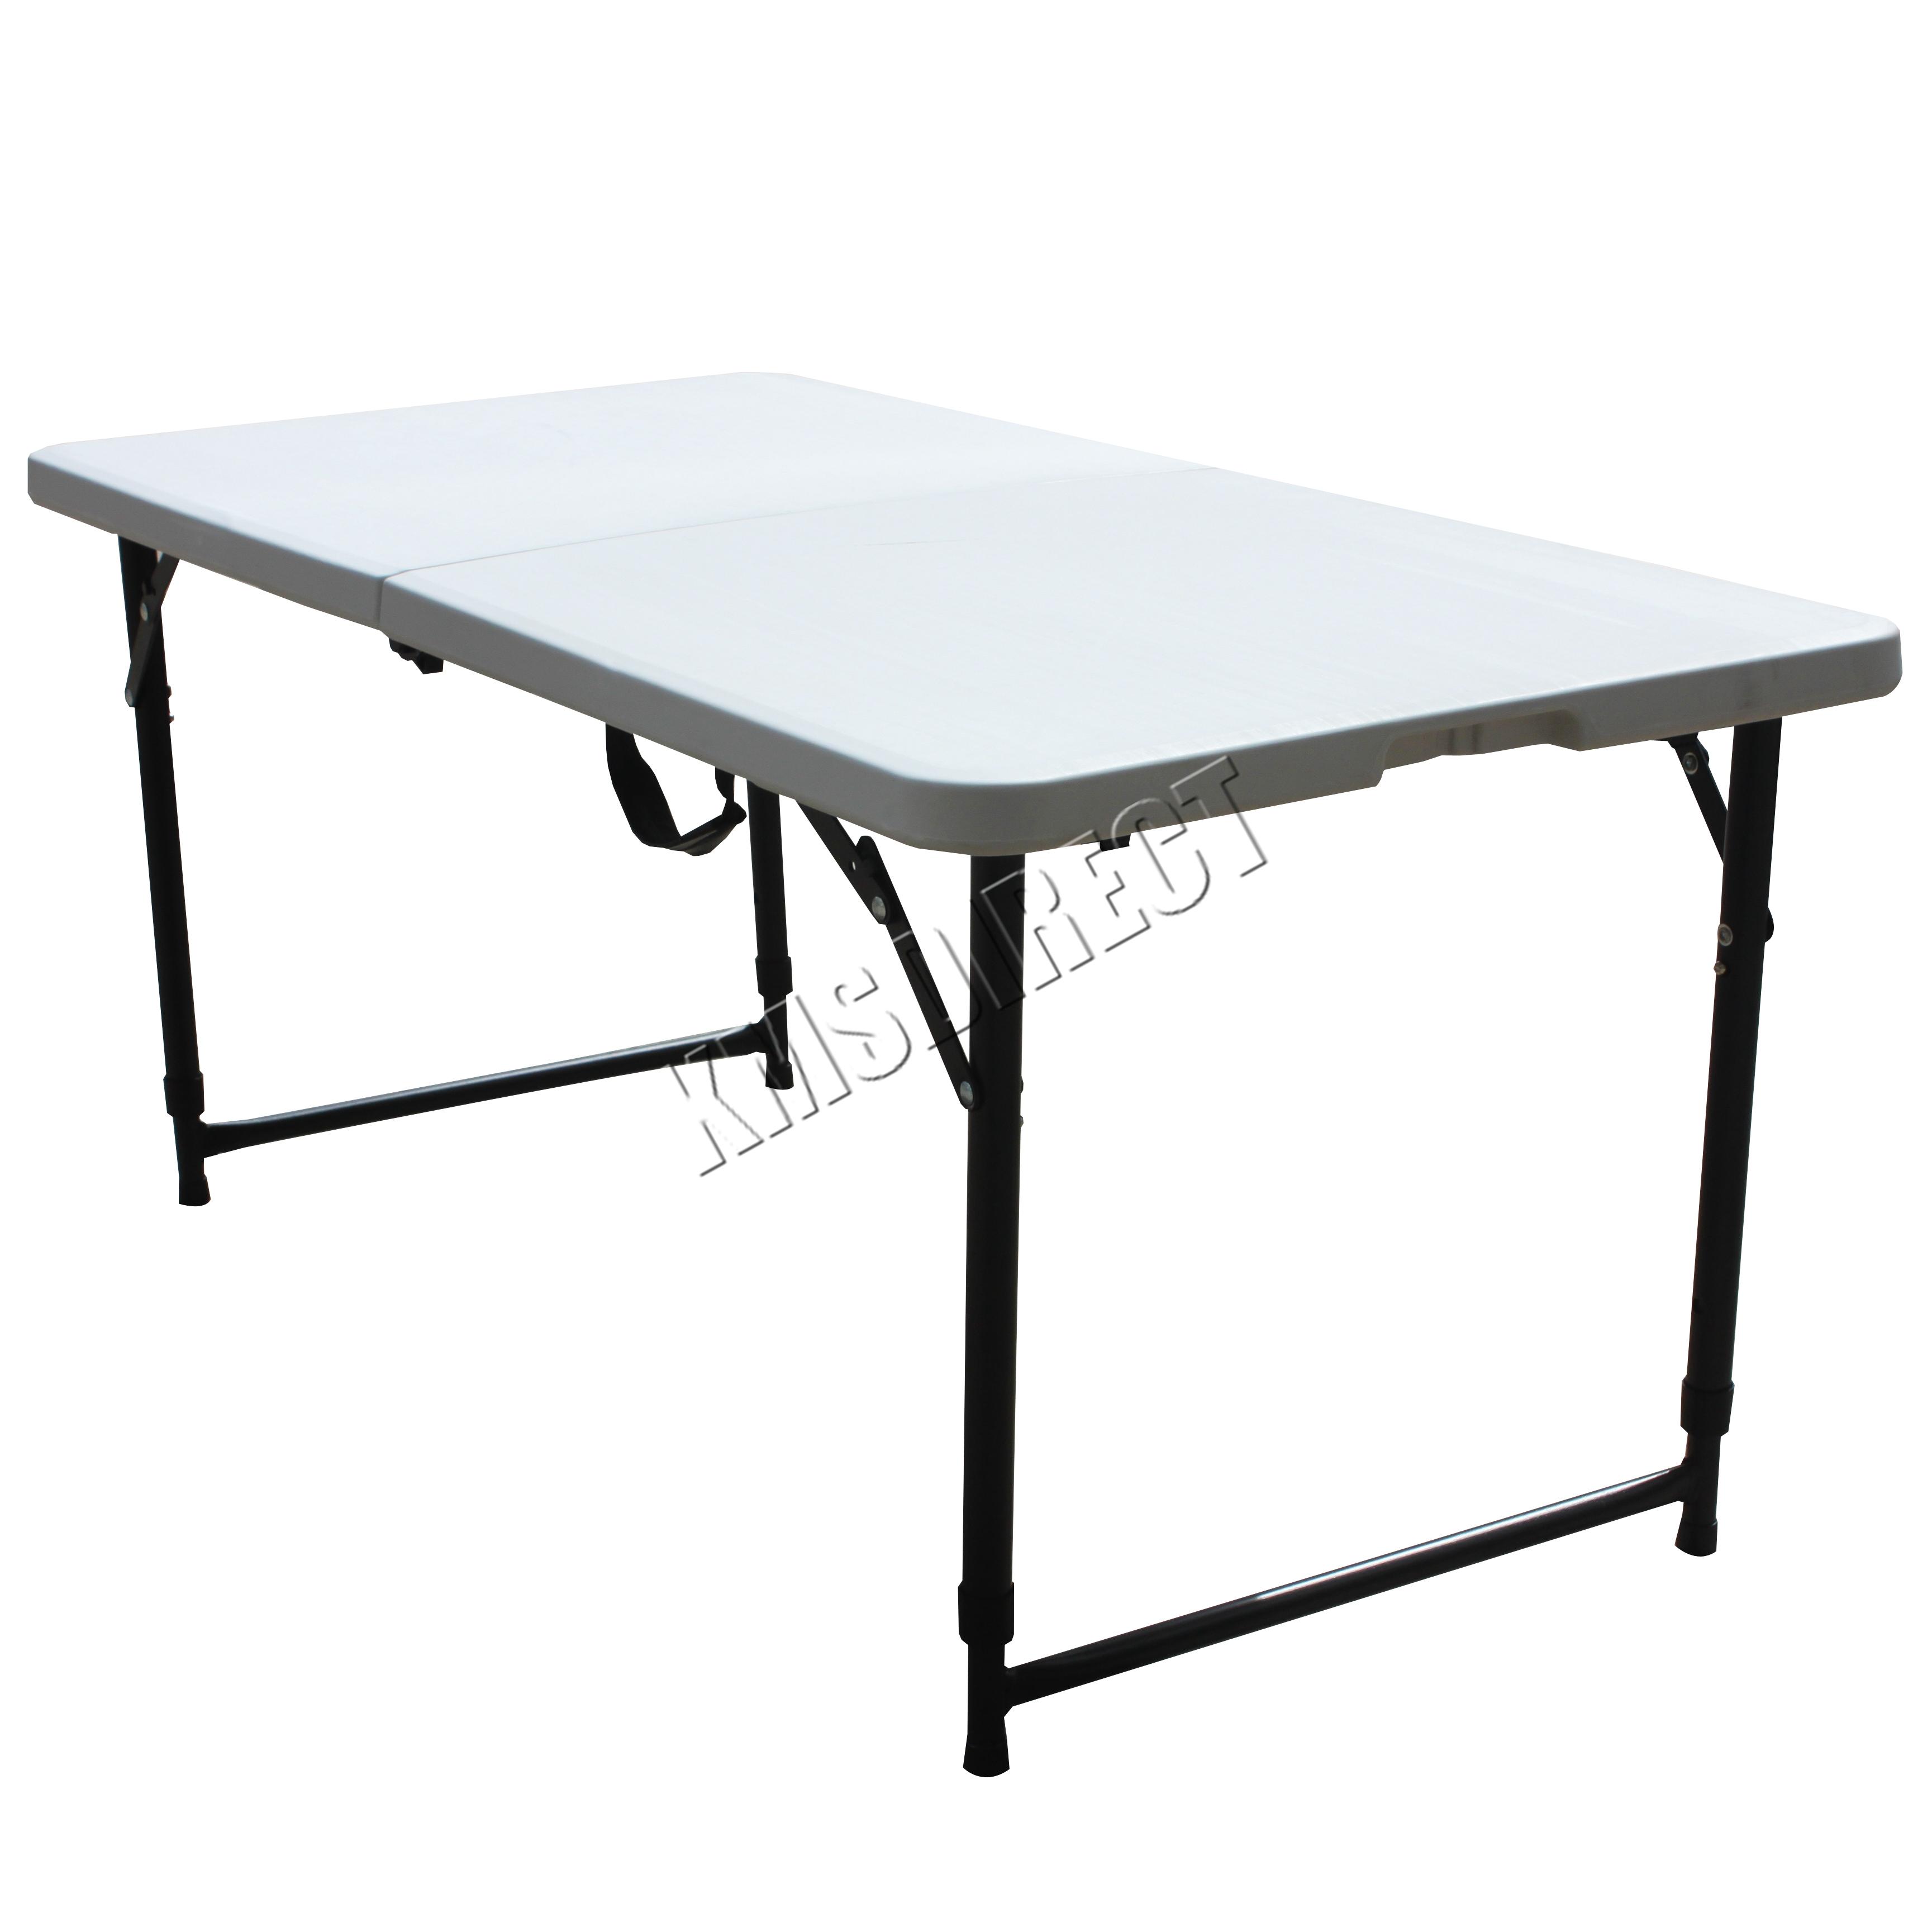 FoxHunter Portable Folding Trestle Table Heavy Duty Plastic